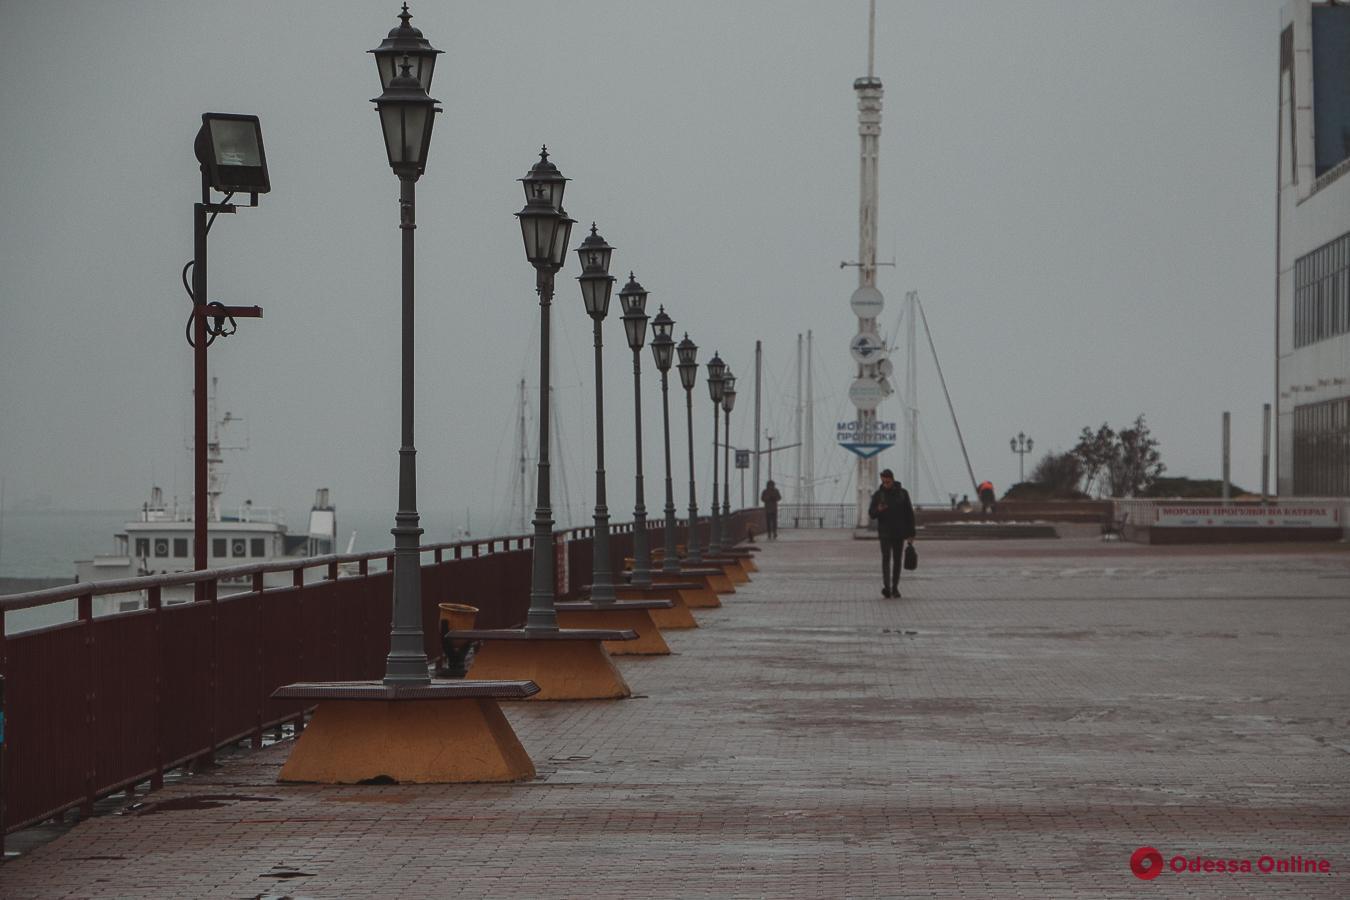 Загадочный одесский морвокзал в тумане (фоторепортаж)